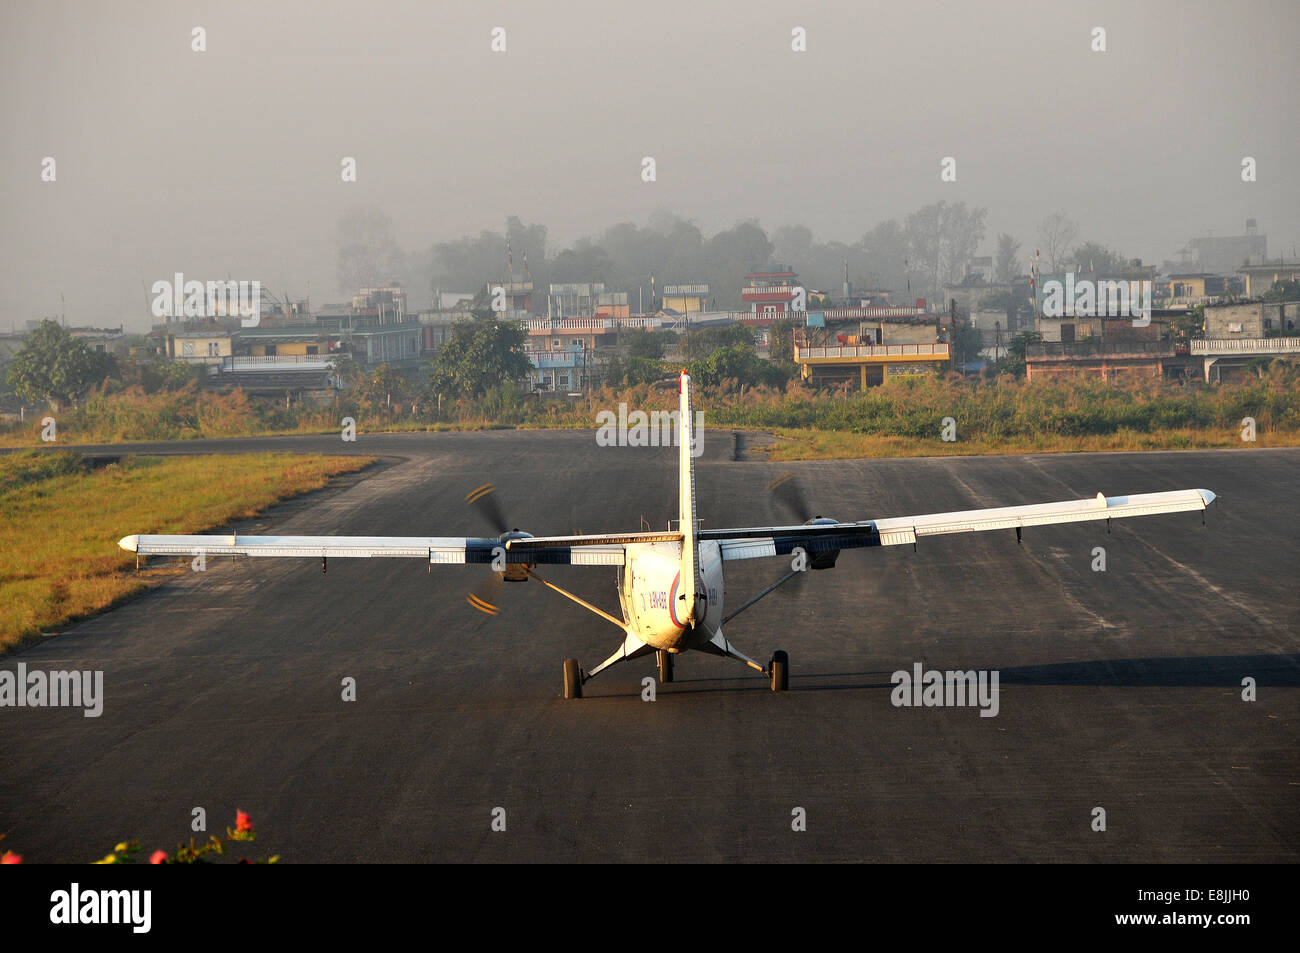 Pokhara airport - Stock Image